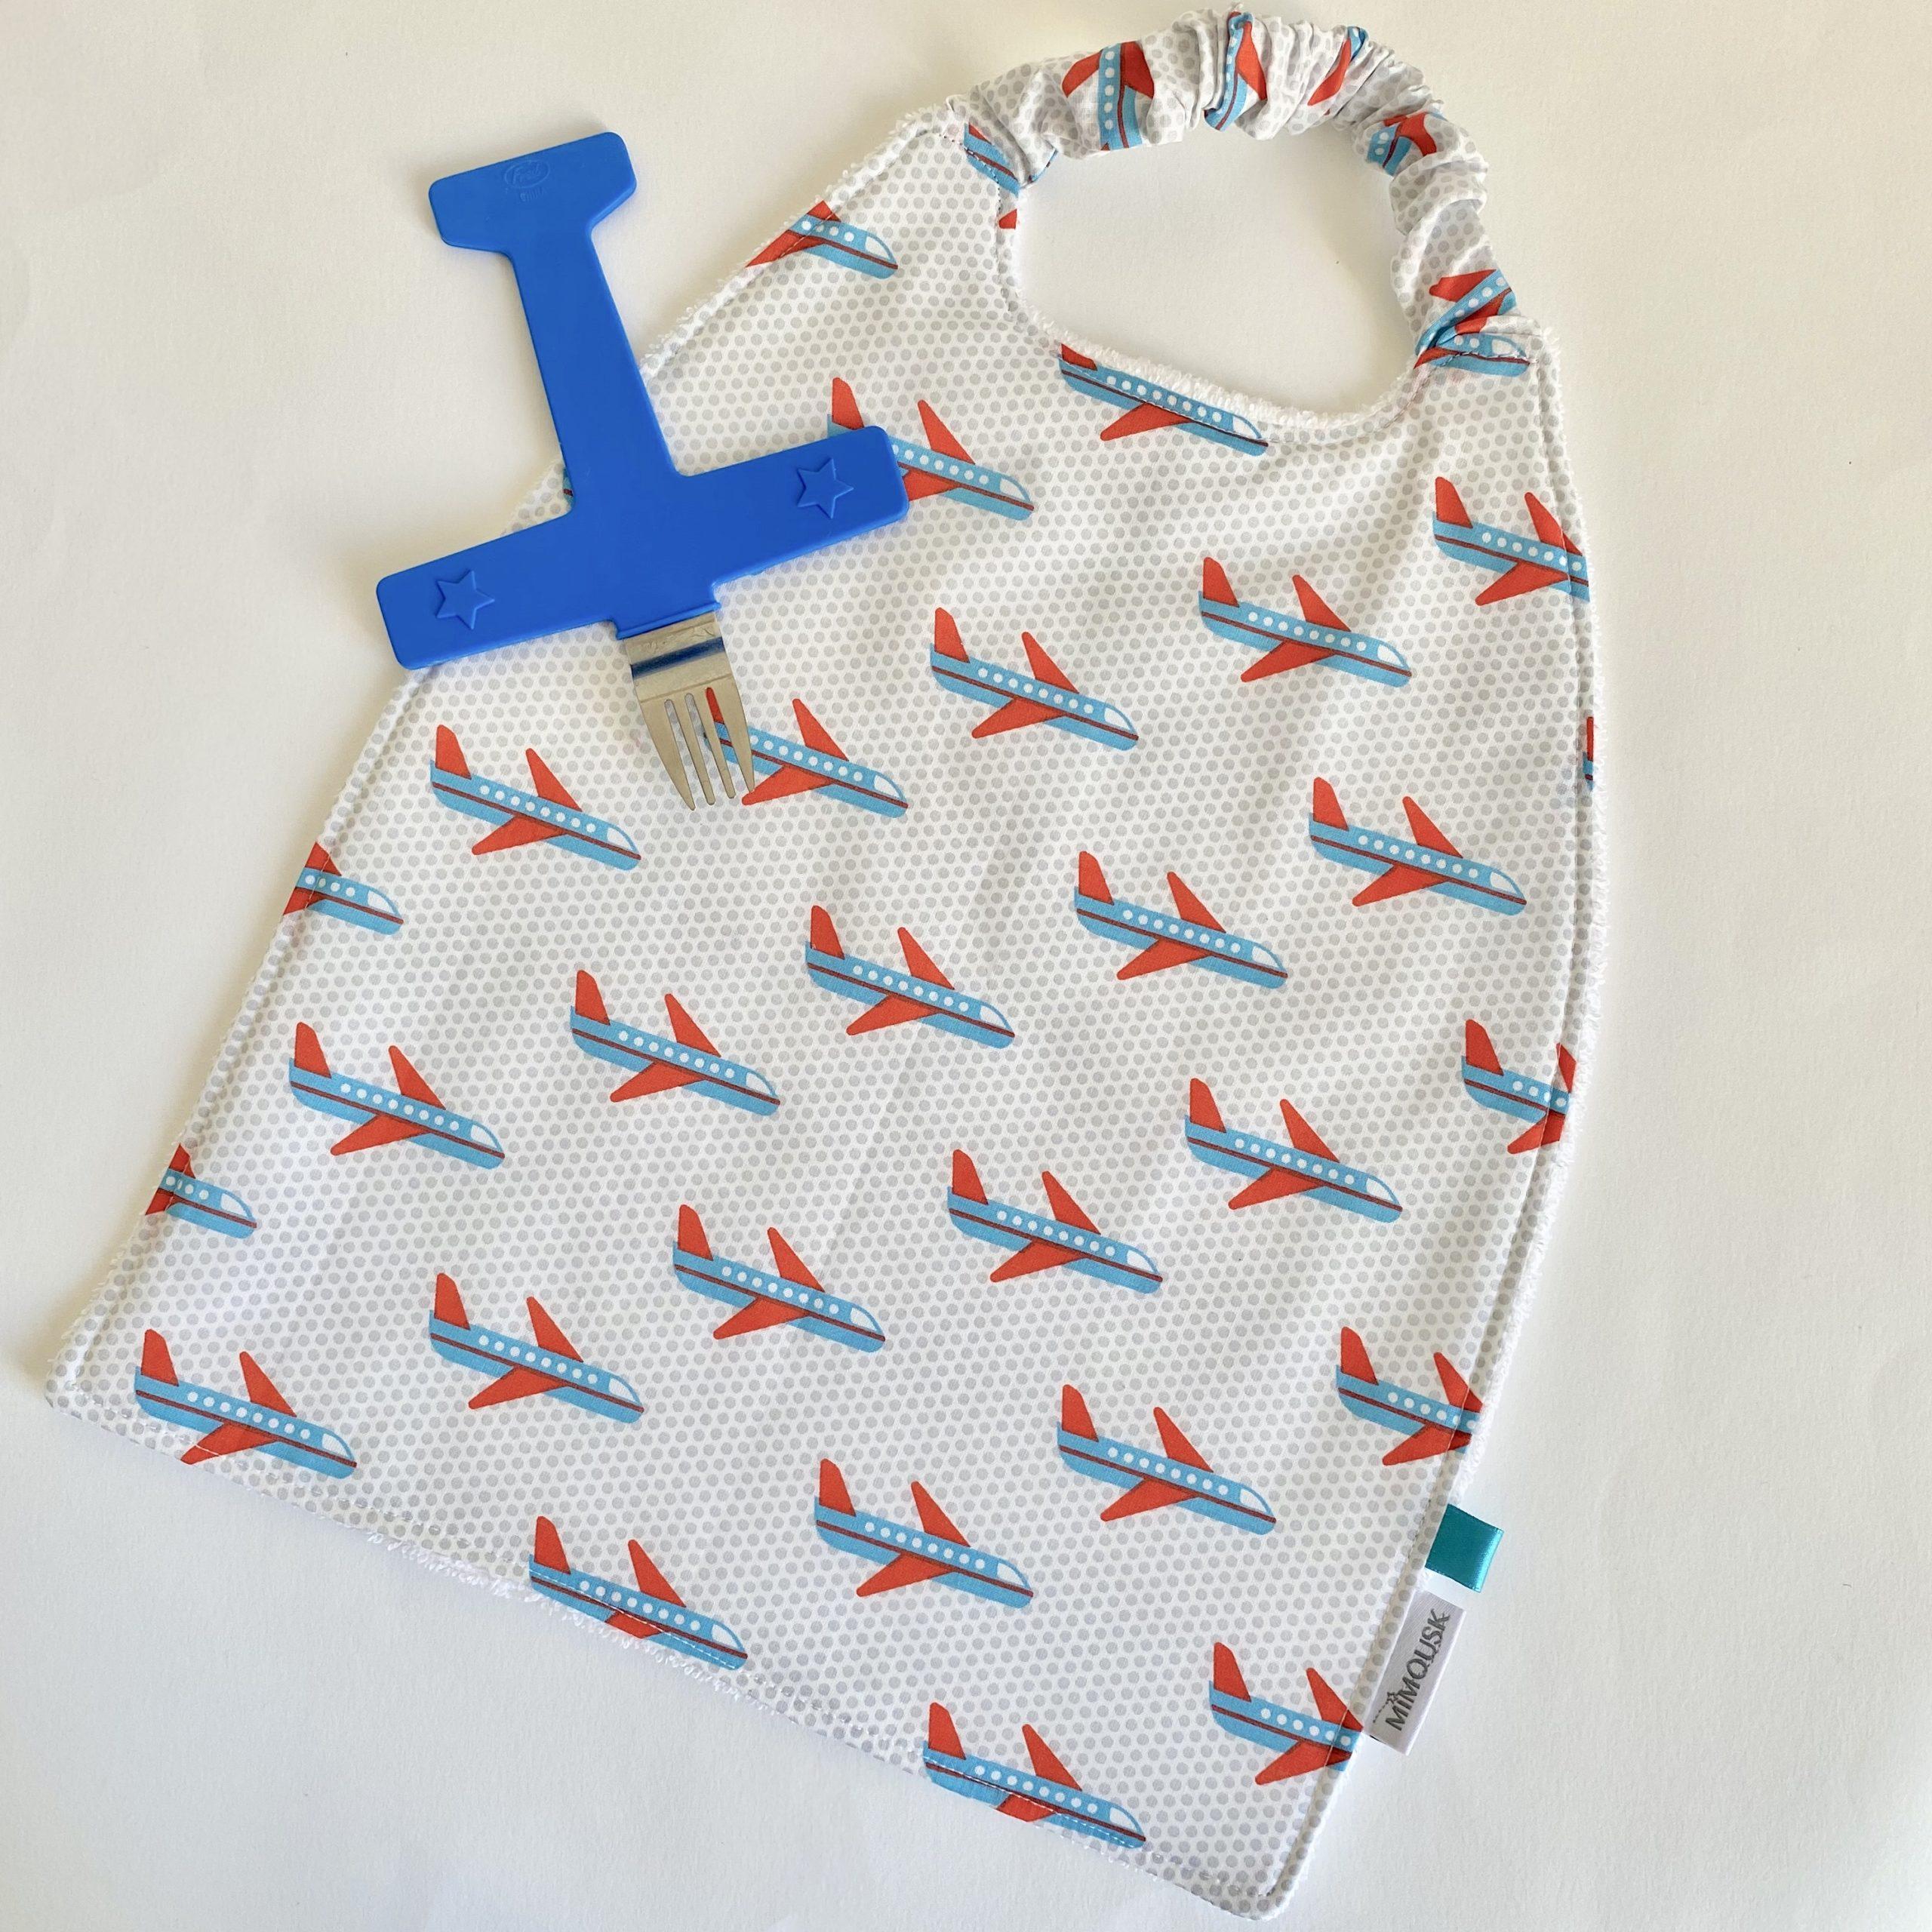 grande serviette elastiquee mimousk.com